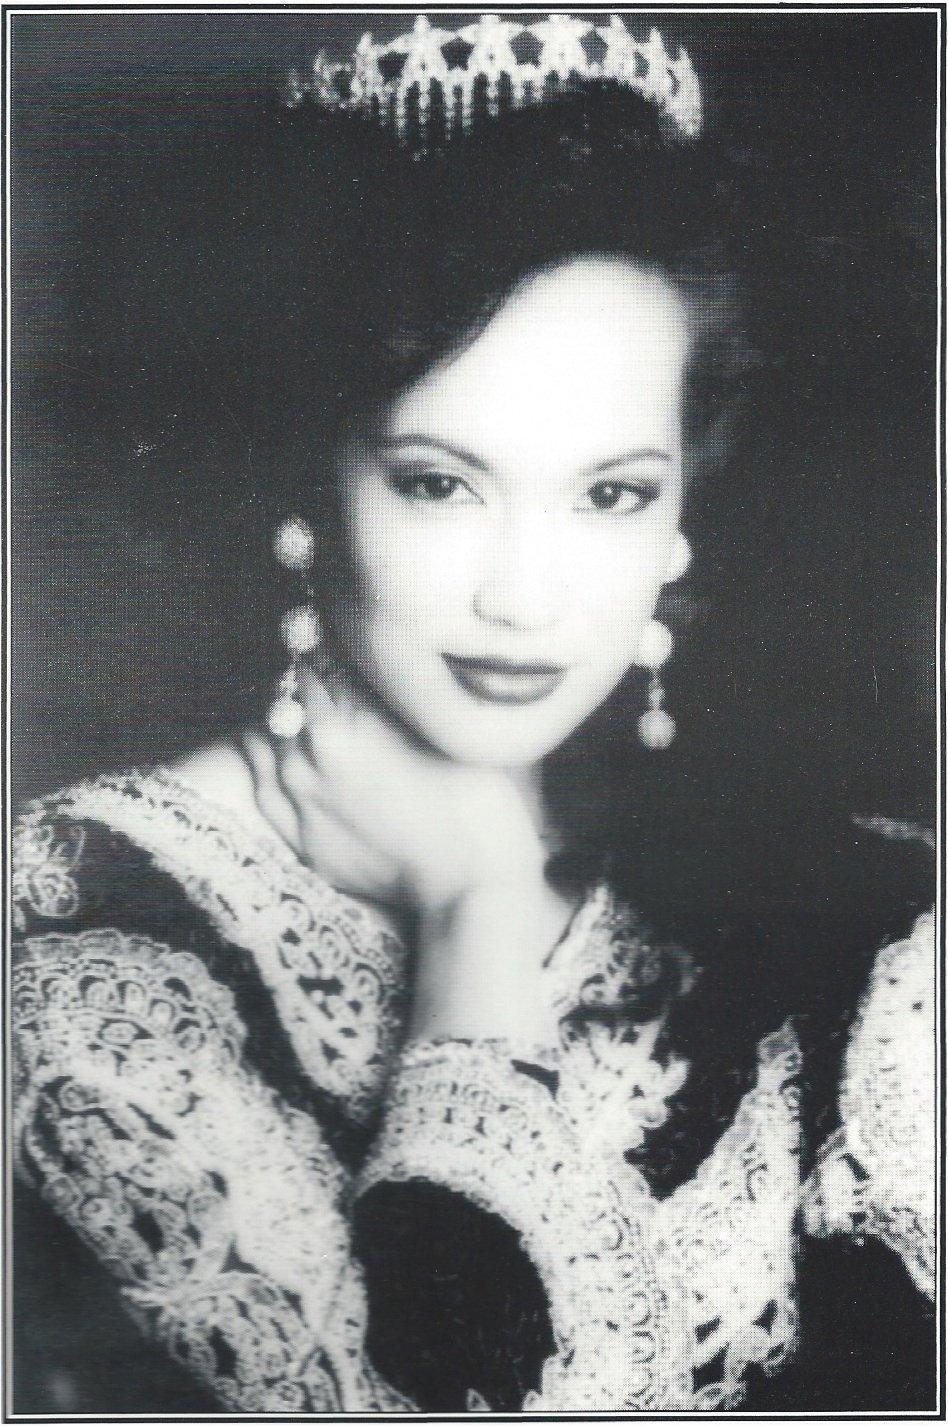 1991 Kym Digmon (Top 11 at Miss USA)